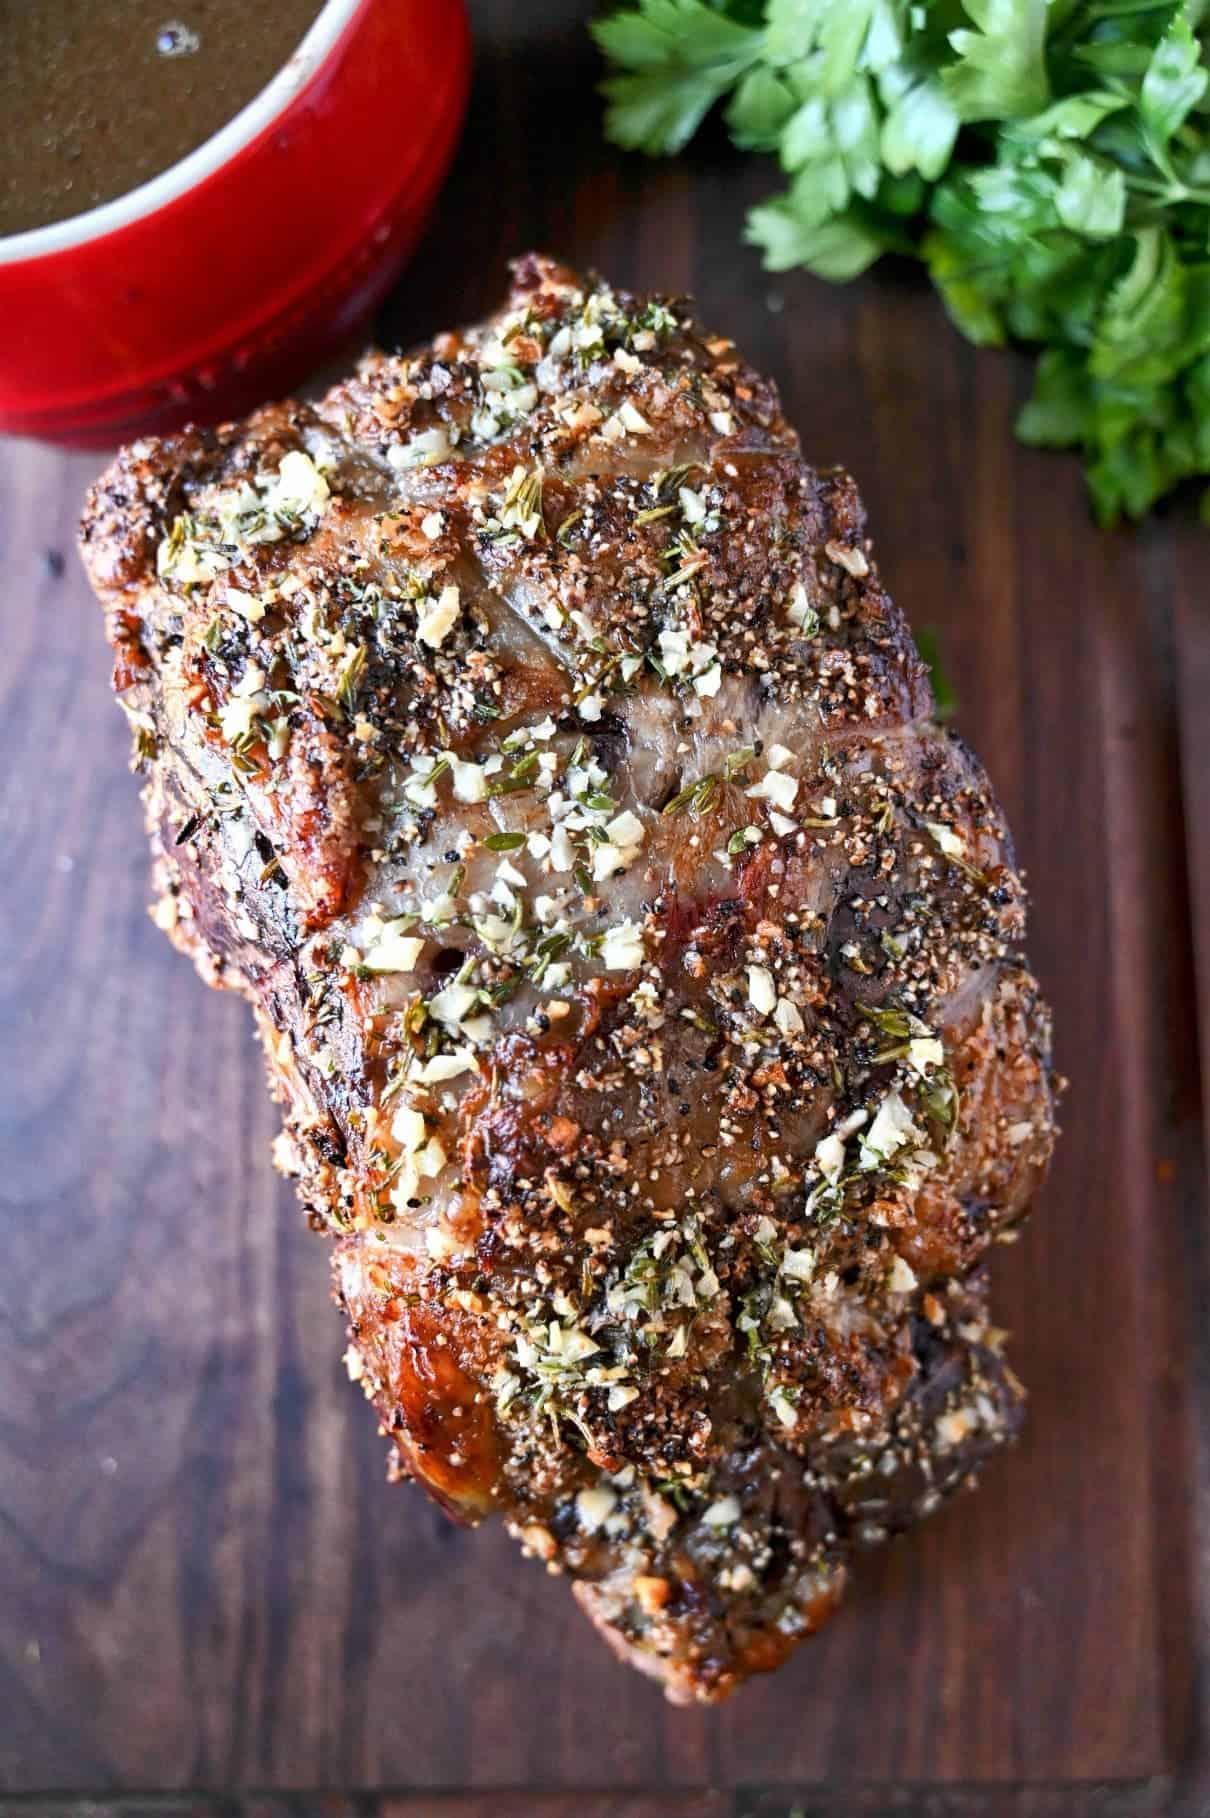 Herb crusted rib eye roast on a cutting board ready to be sliced.